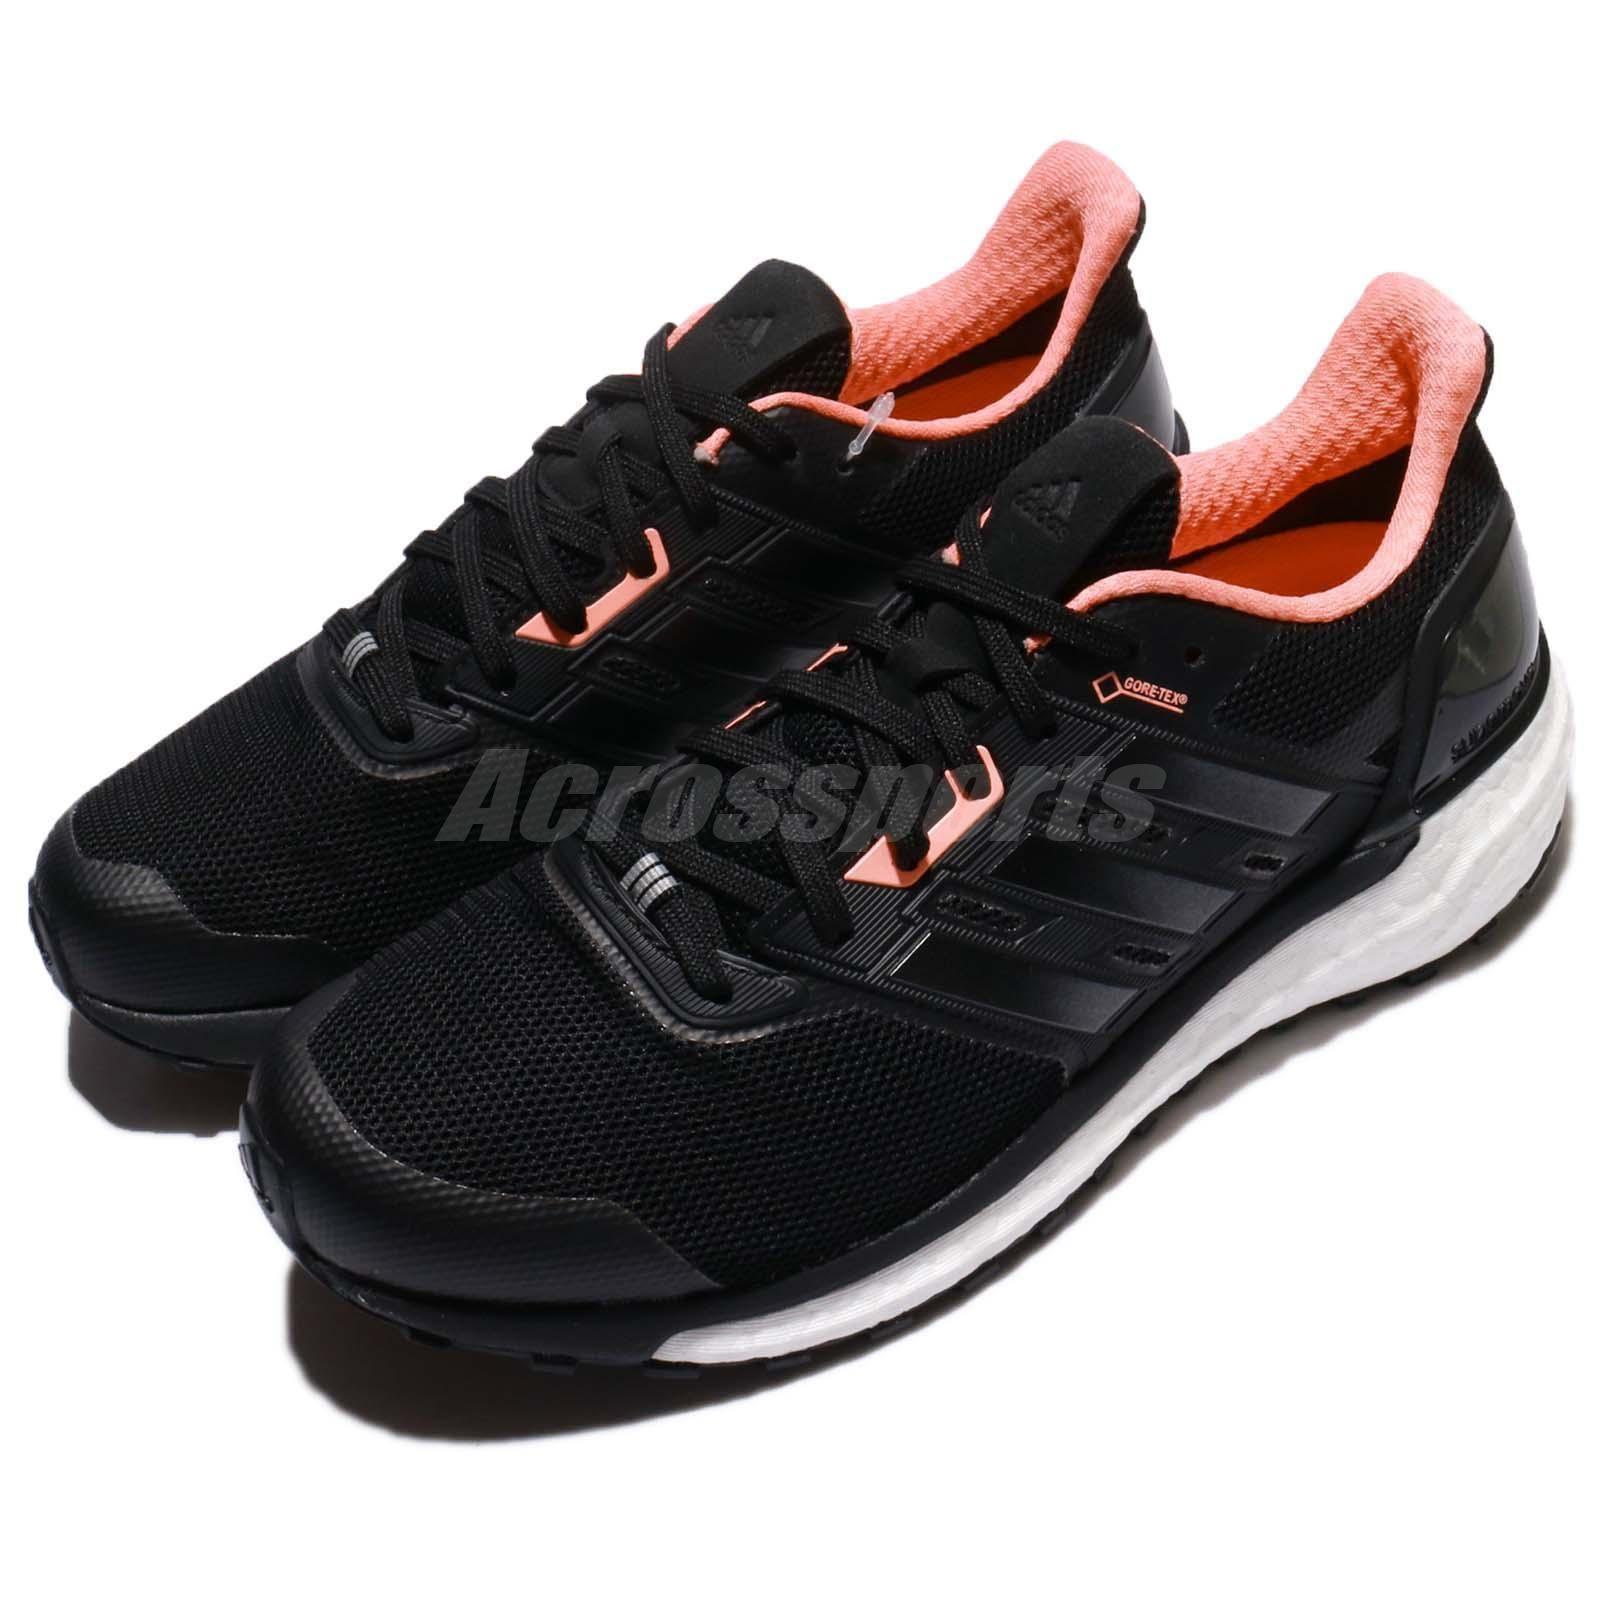 8d8e0d8a7 adidas Supernova GTX W Gore-Tex Black Pink White Women Running Shoes BB3671